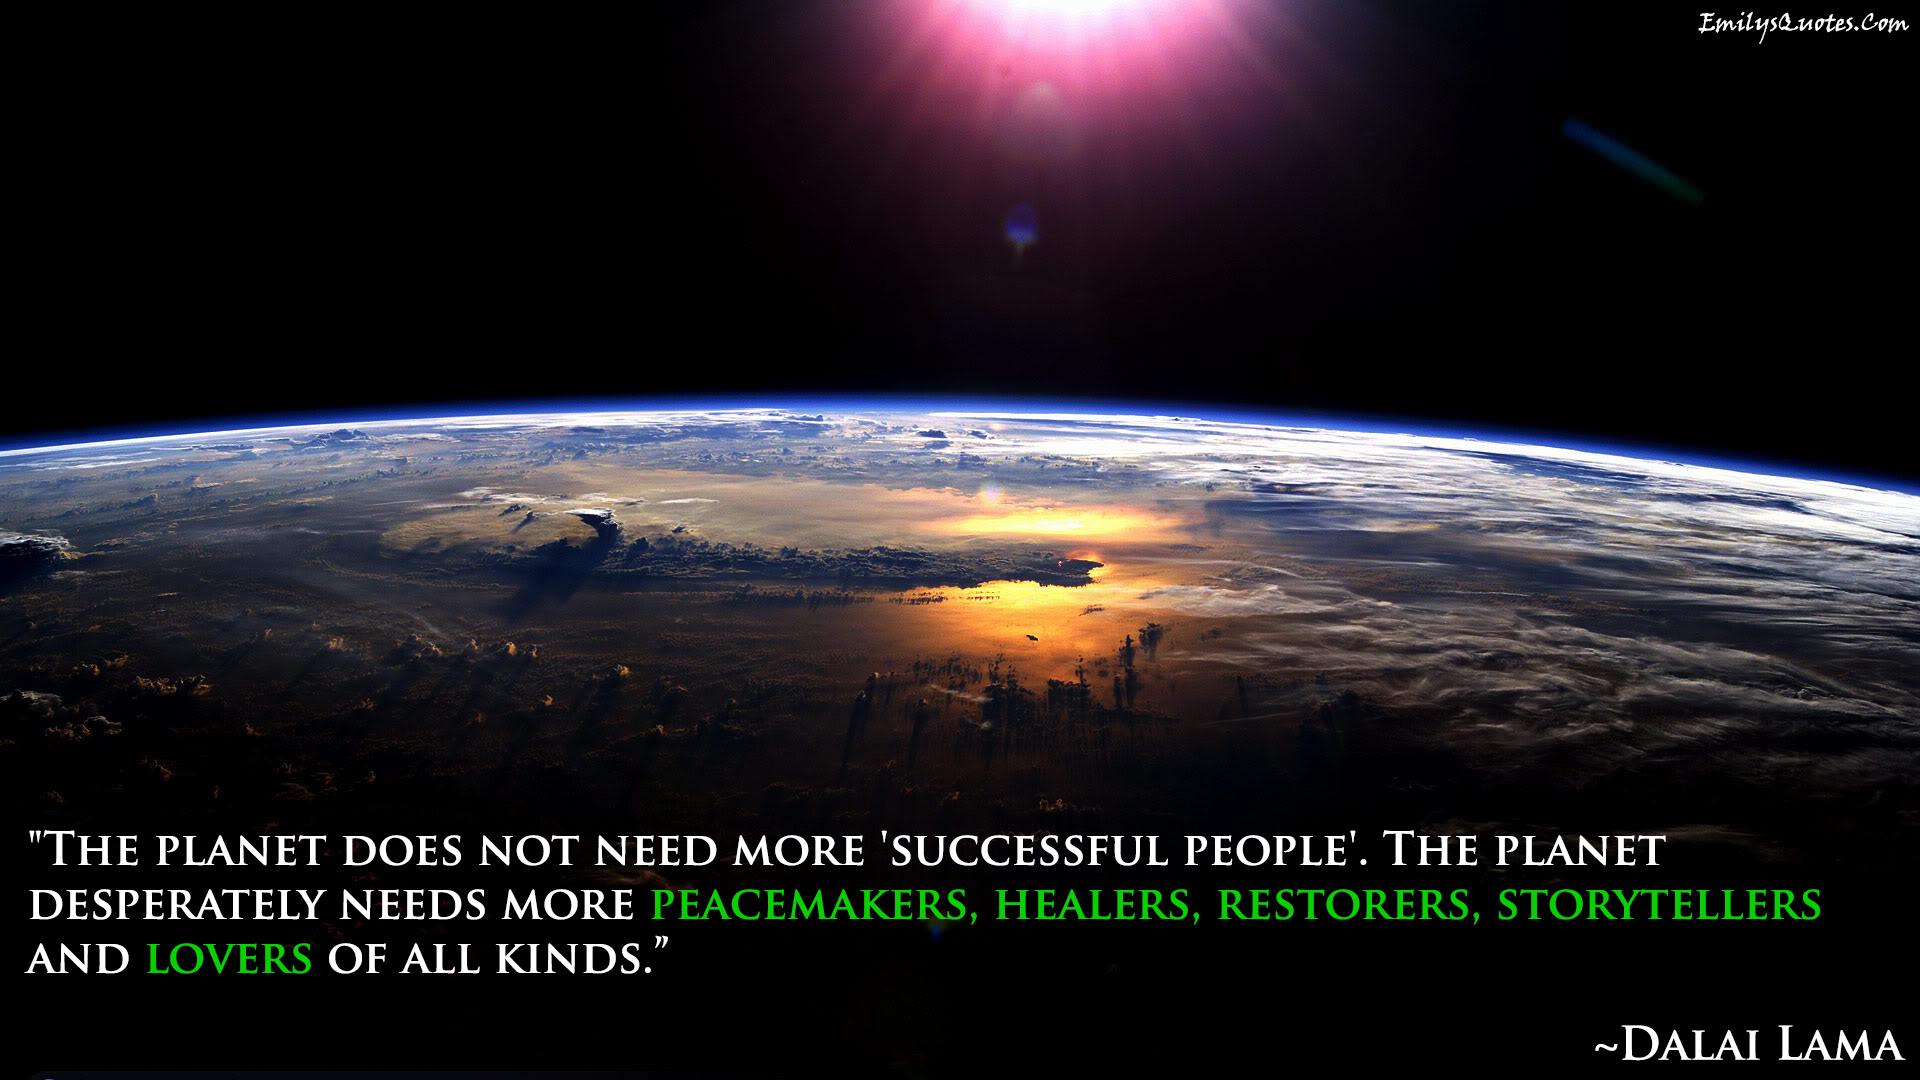 EmilysQuotes.Com - wisdom, Dalai Lama